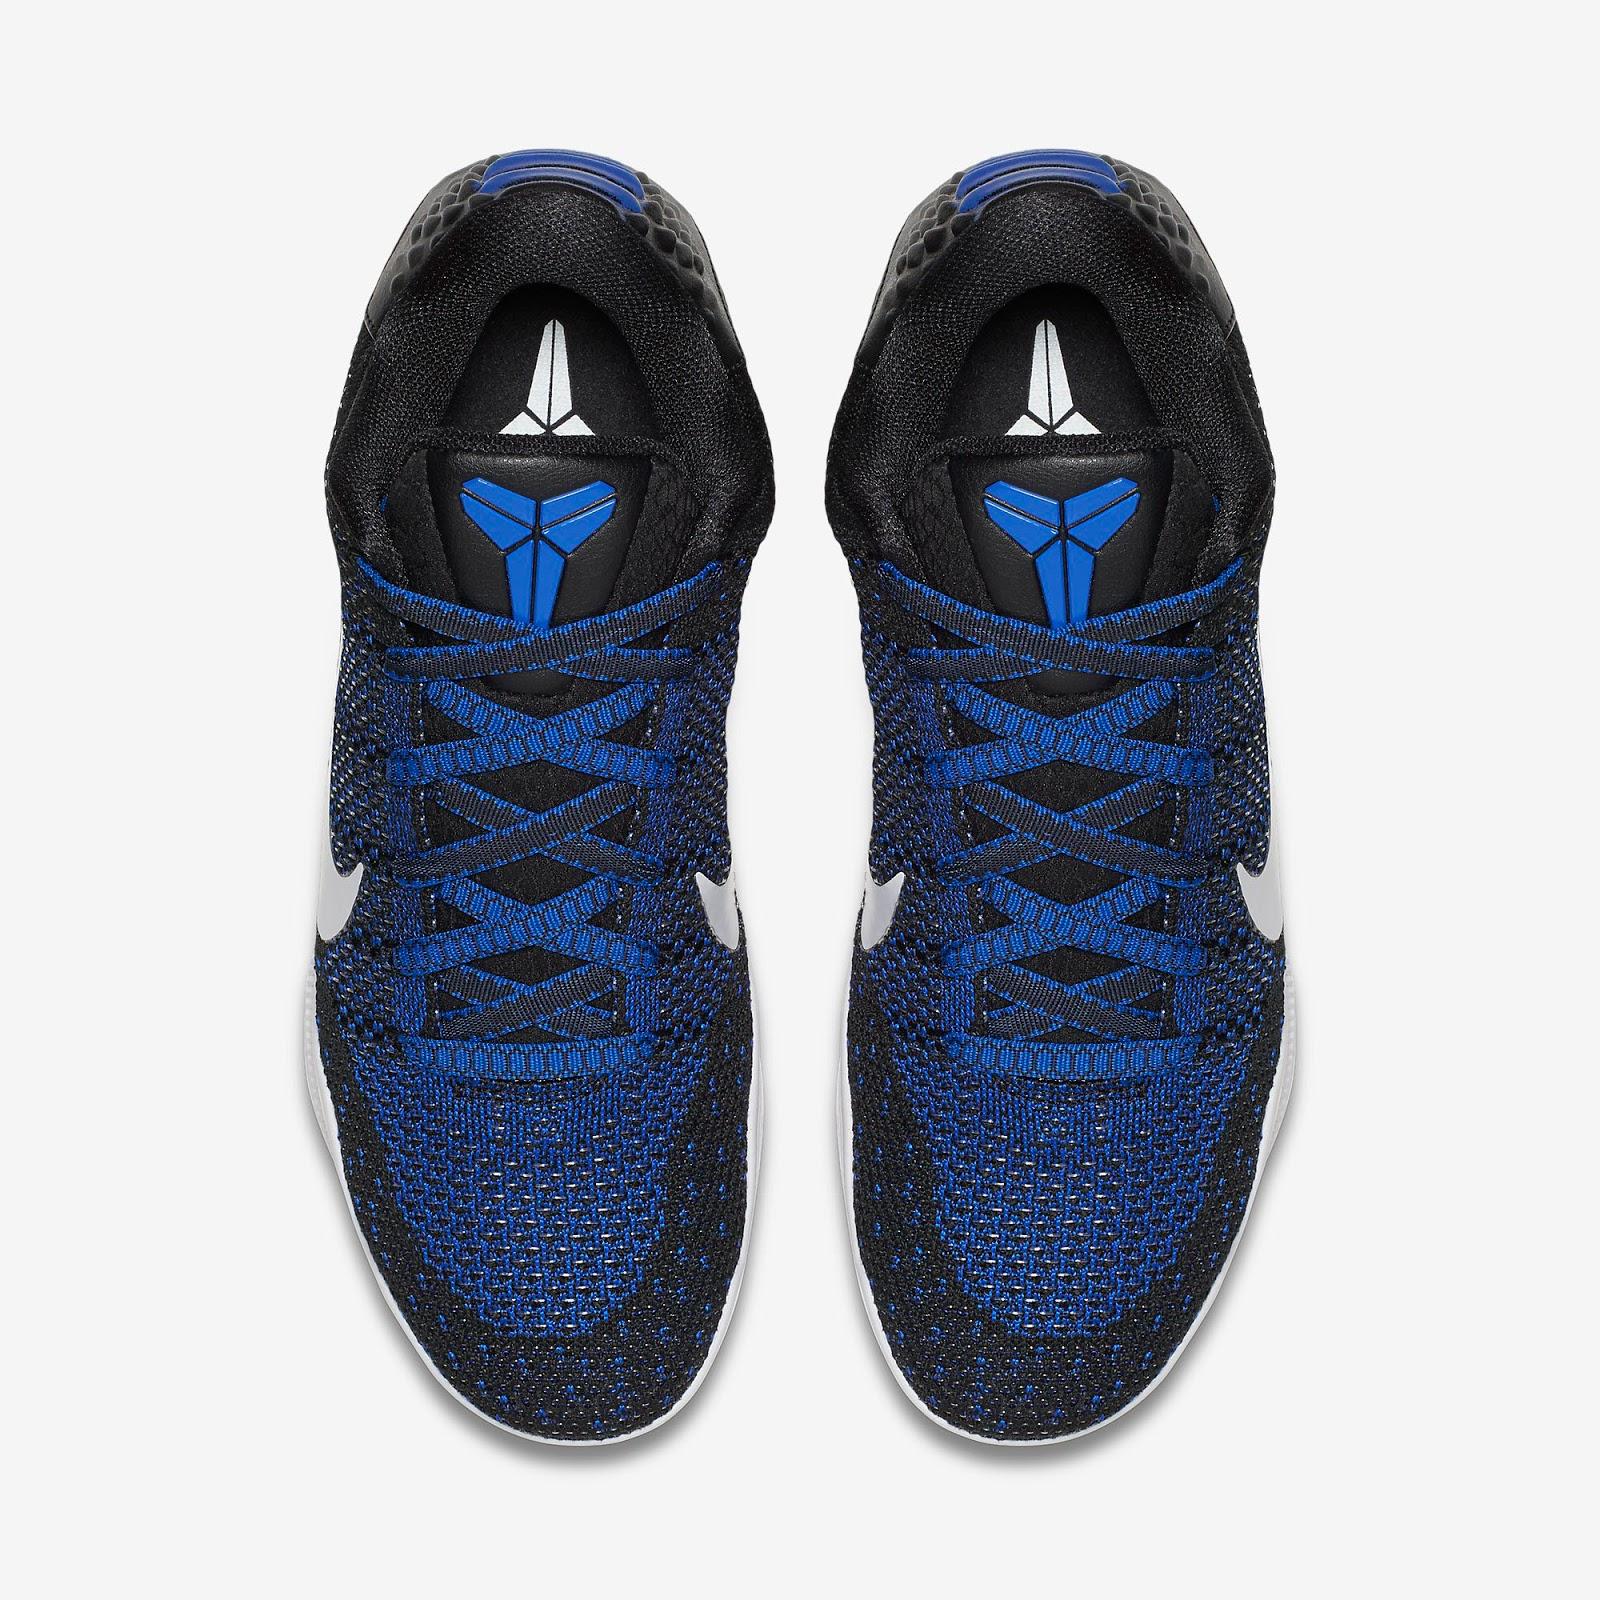 fb09768d1f9d ajordanxi Your  1 Source For Sneaker Release Dates  Nike Kobe 11 ...